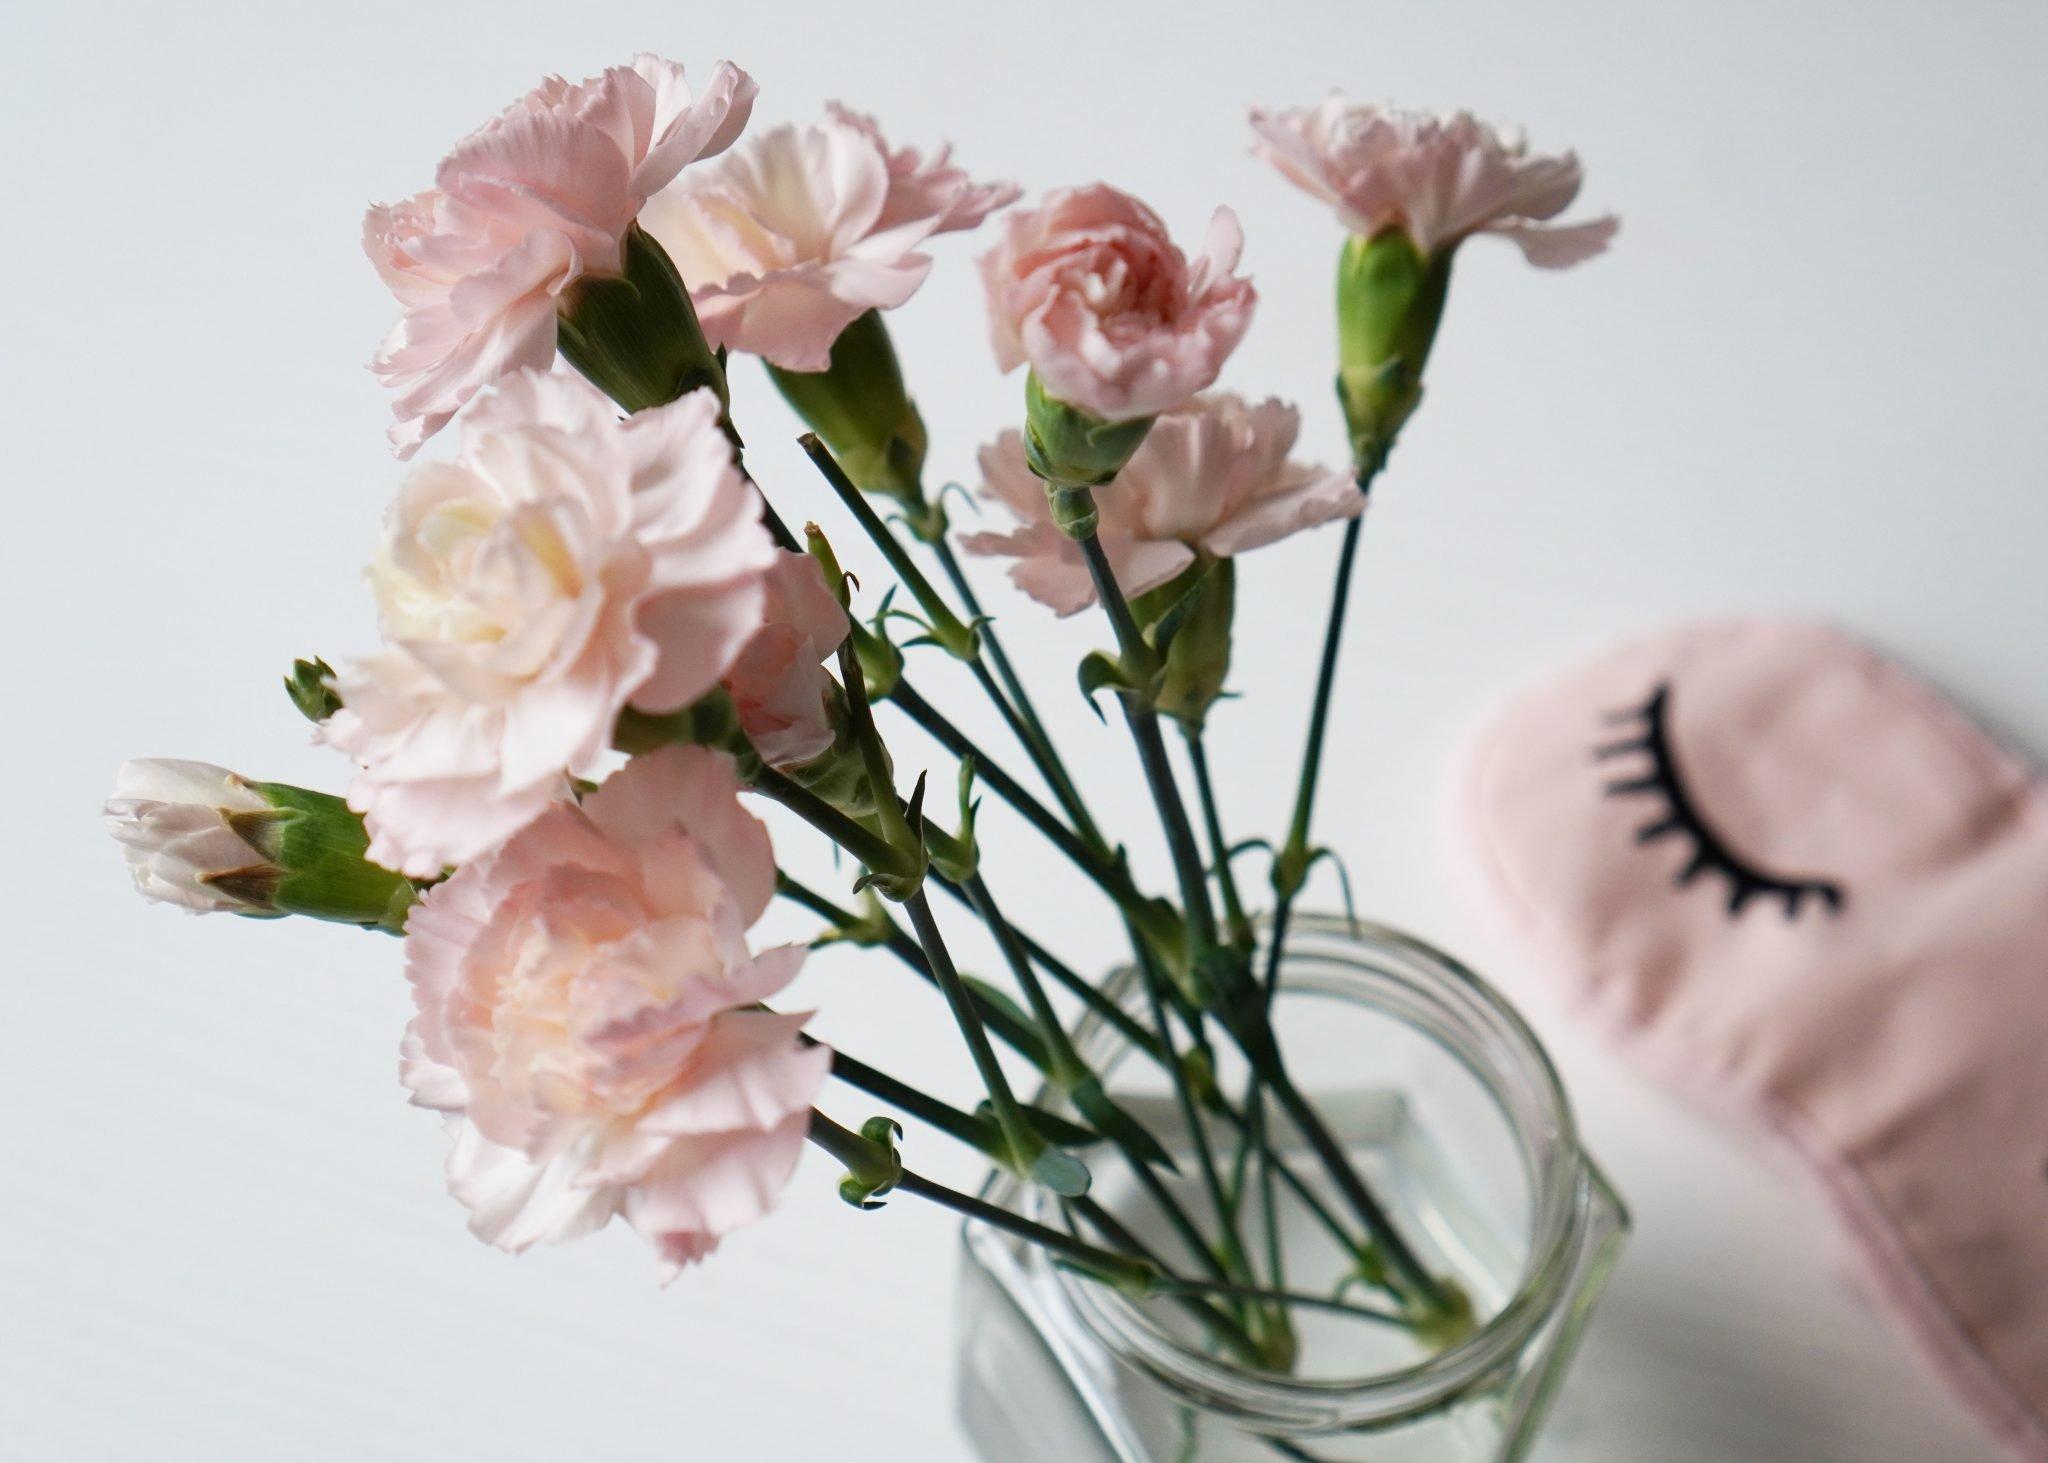 vaaleanpunaisia neilikkoja ja unimaski